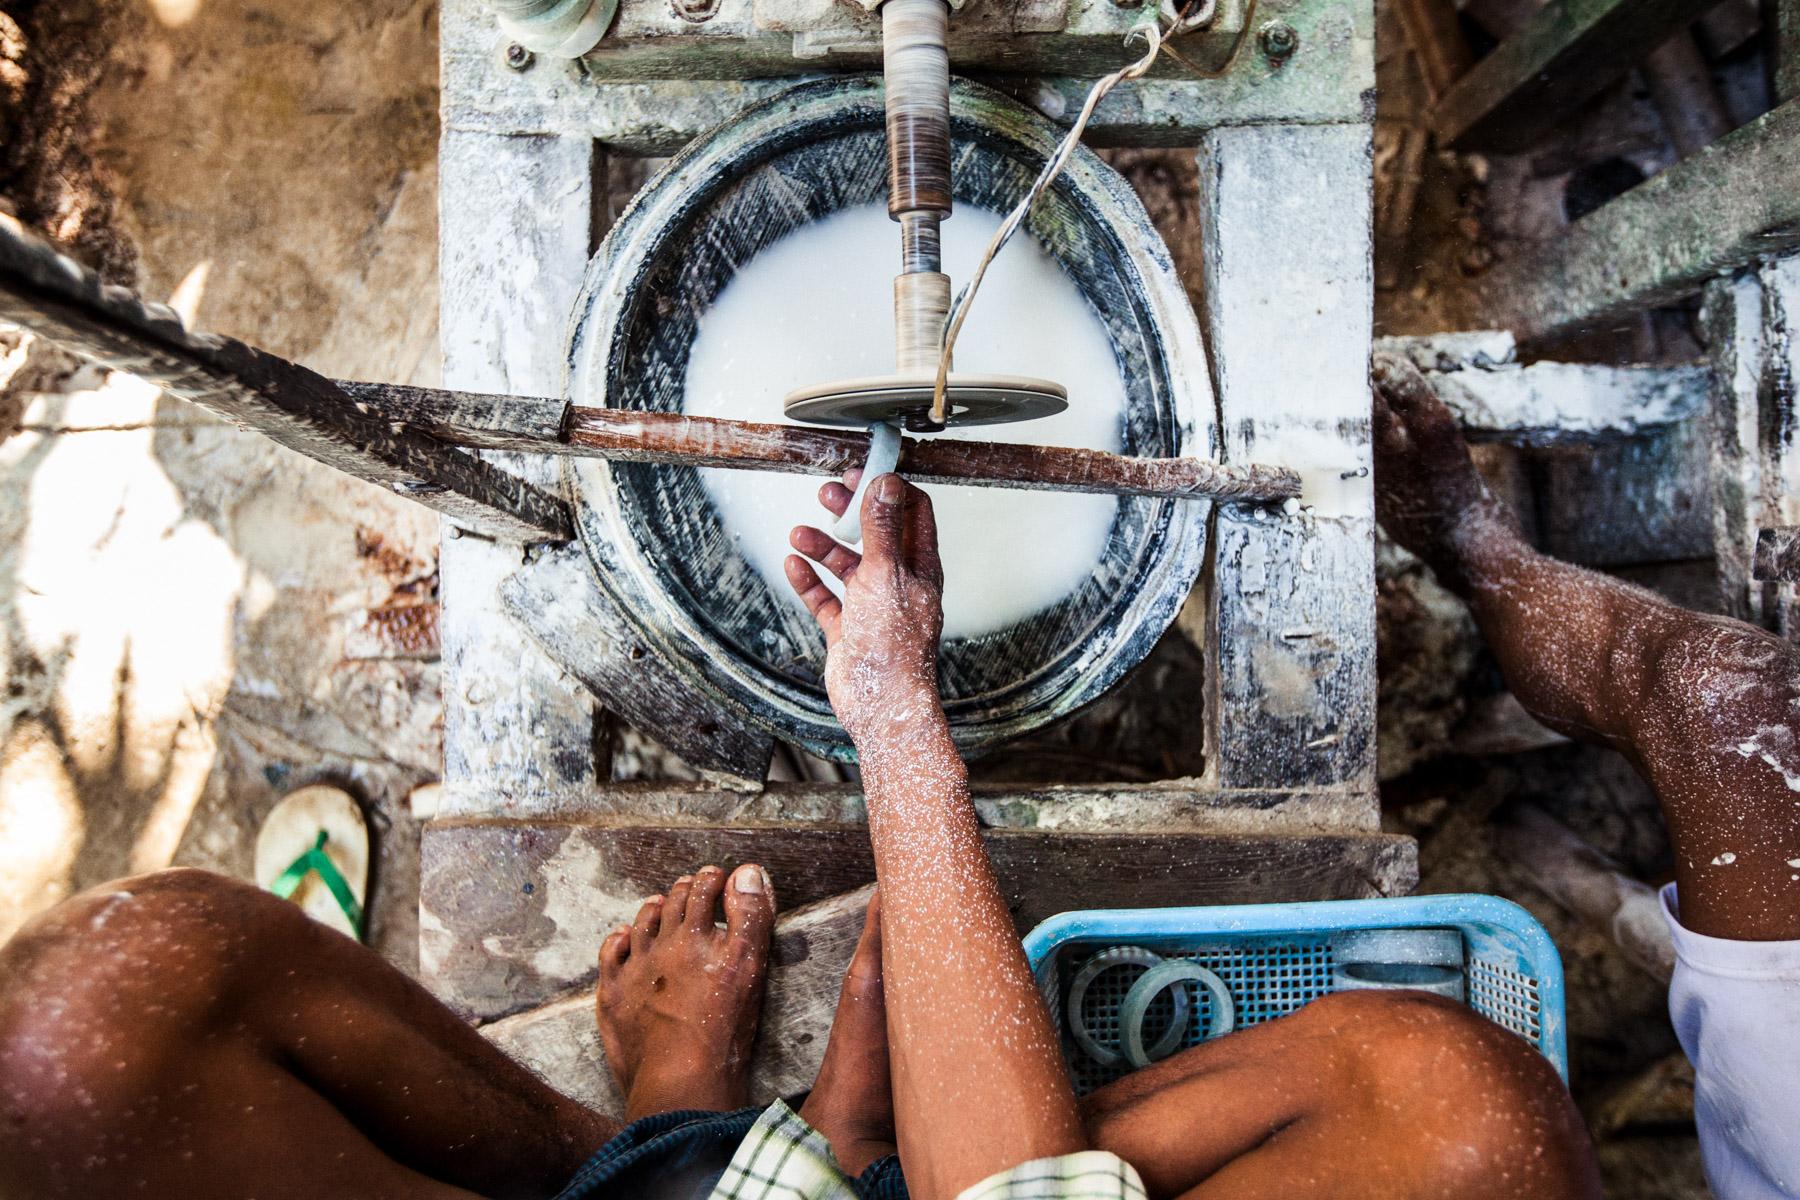 A man polishes a jade bracelet in Mandalay, Myanmar.